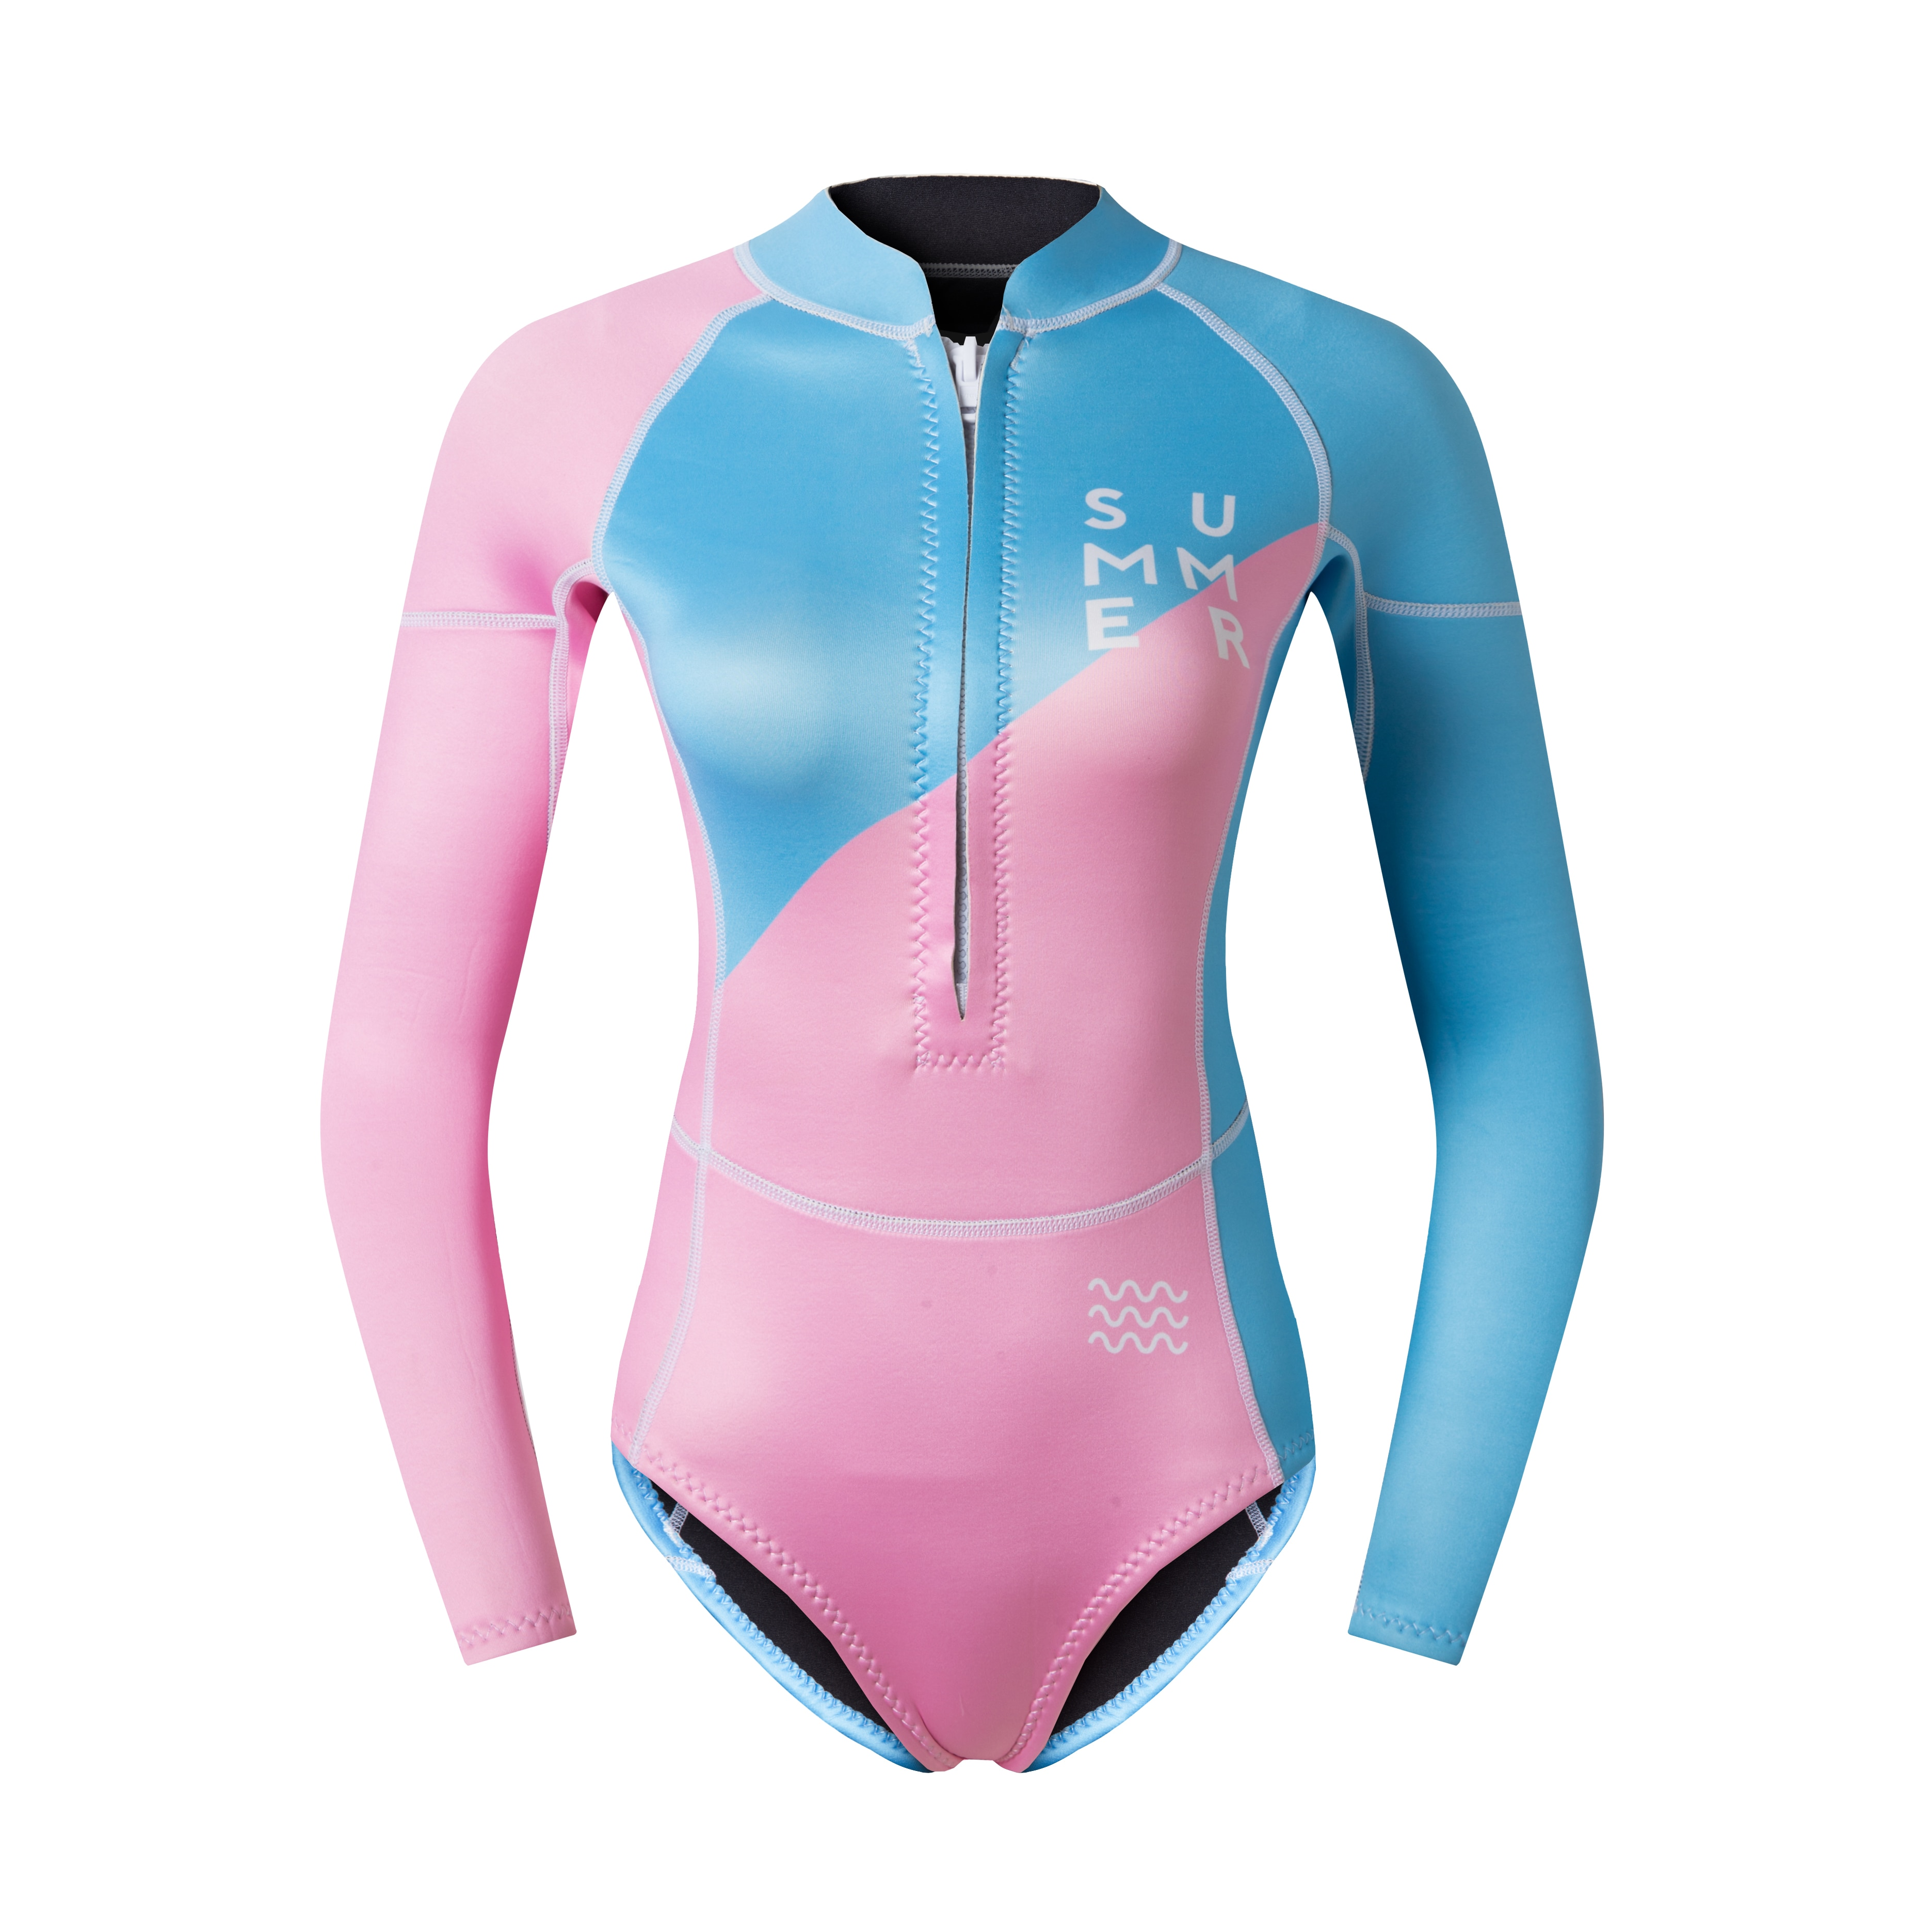 yamamoto neoprene wetsuit in 2 mm for surf